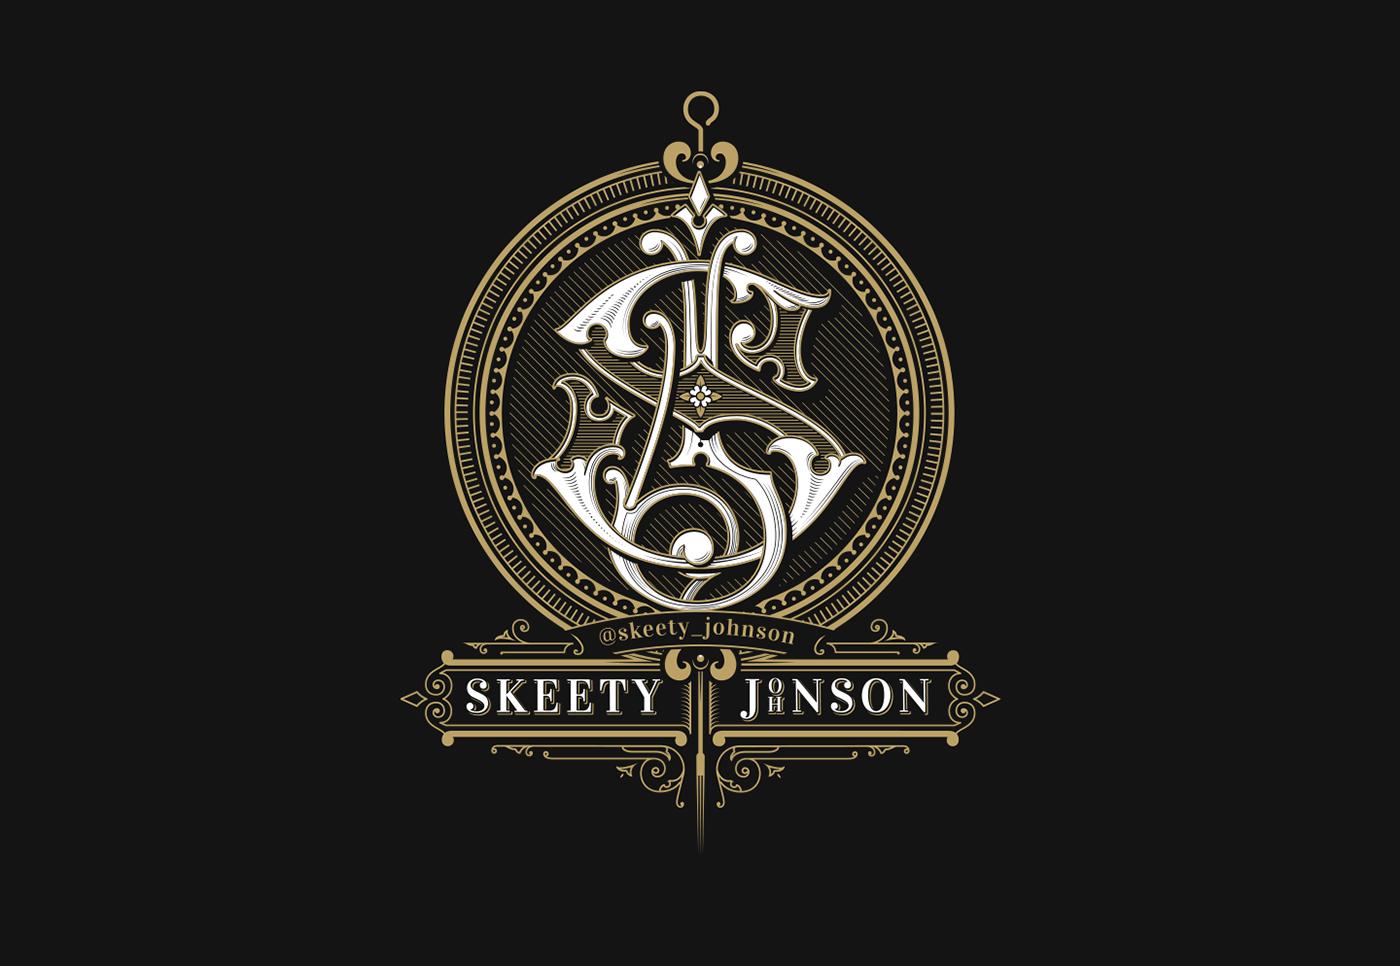 Image may contain: symbol, crown and emblem